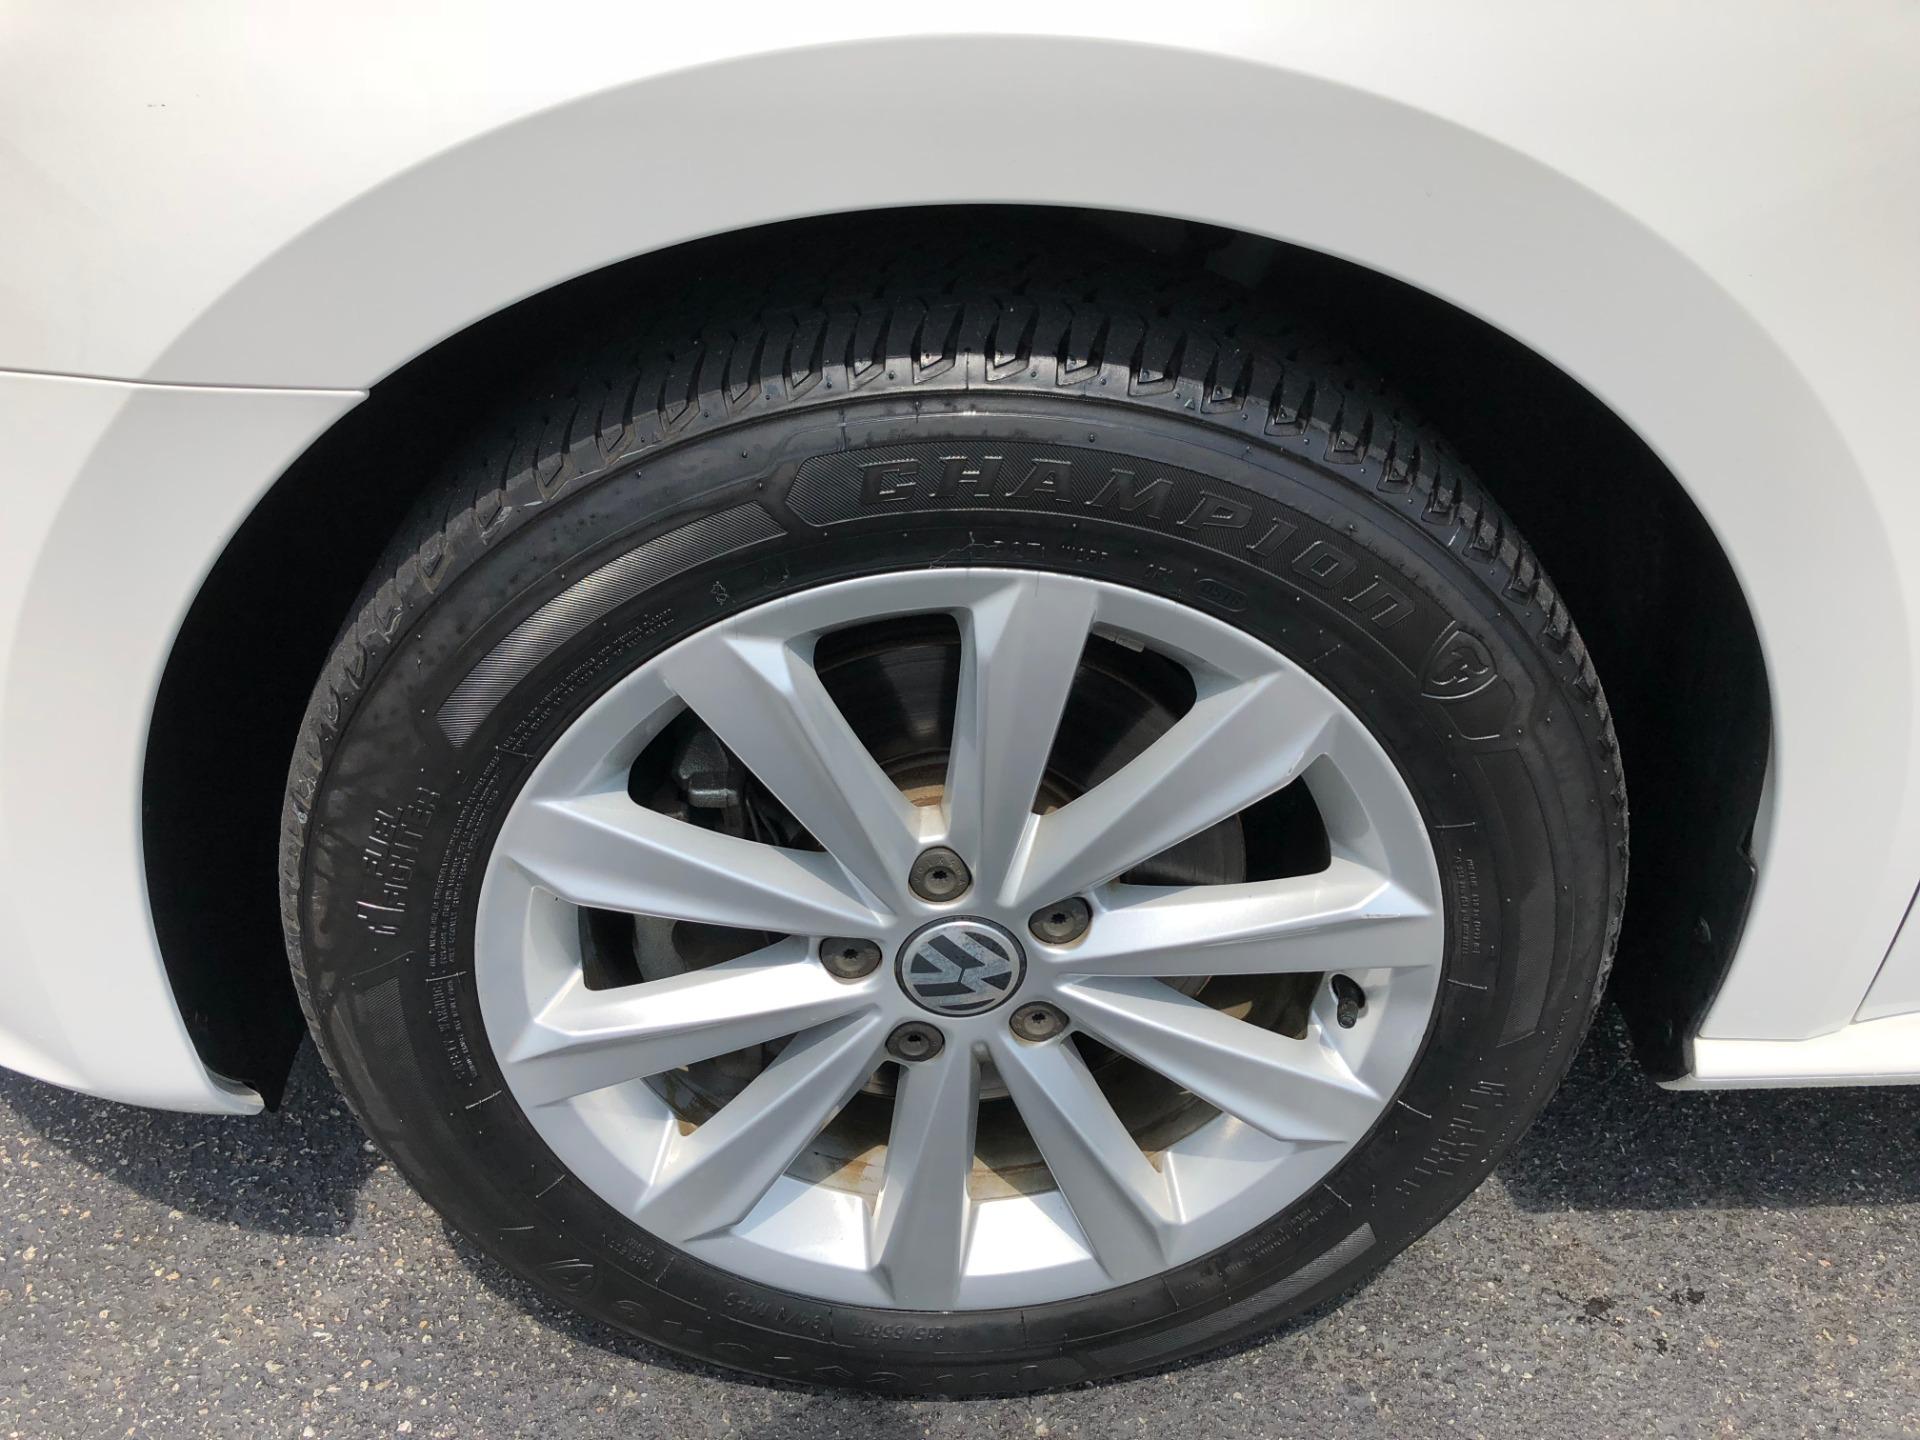 Used-2012-VOLKSWAGEN-PASSAT-SEL-SEL-Chevrolet-Dealer-Vernon-Hills